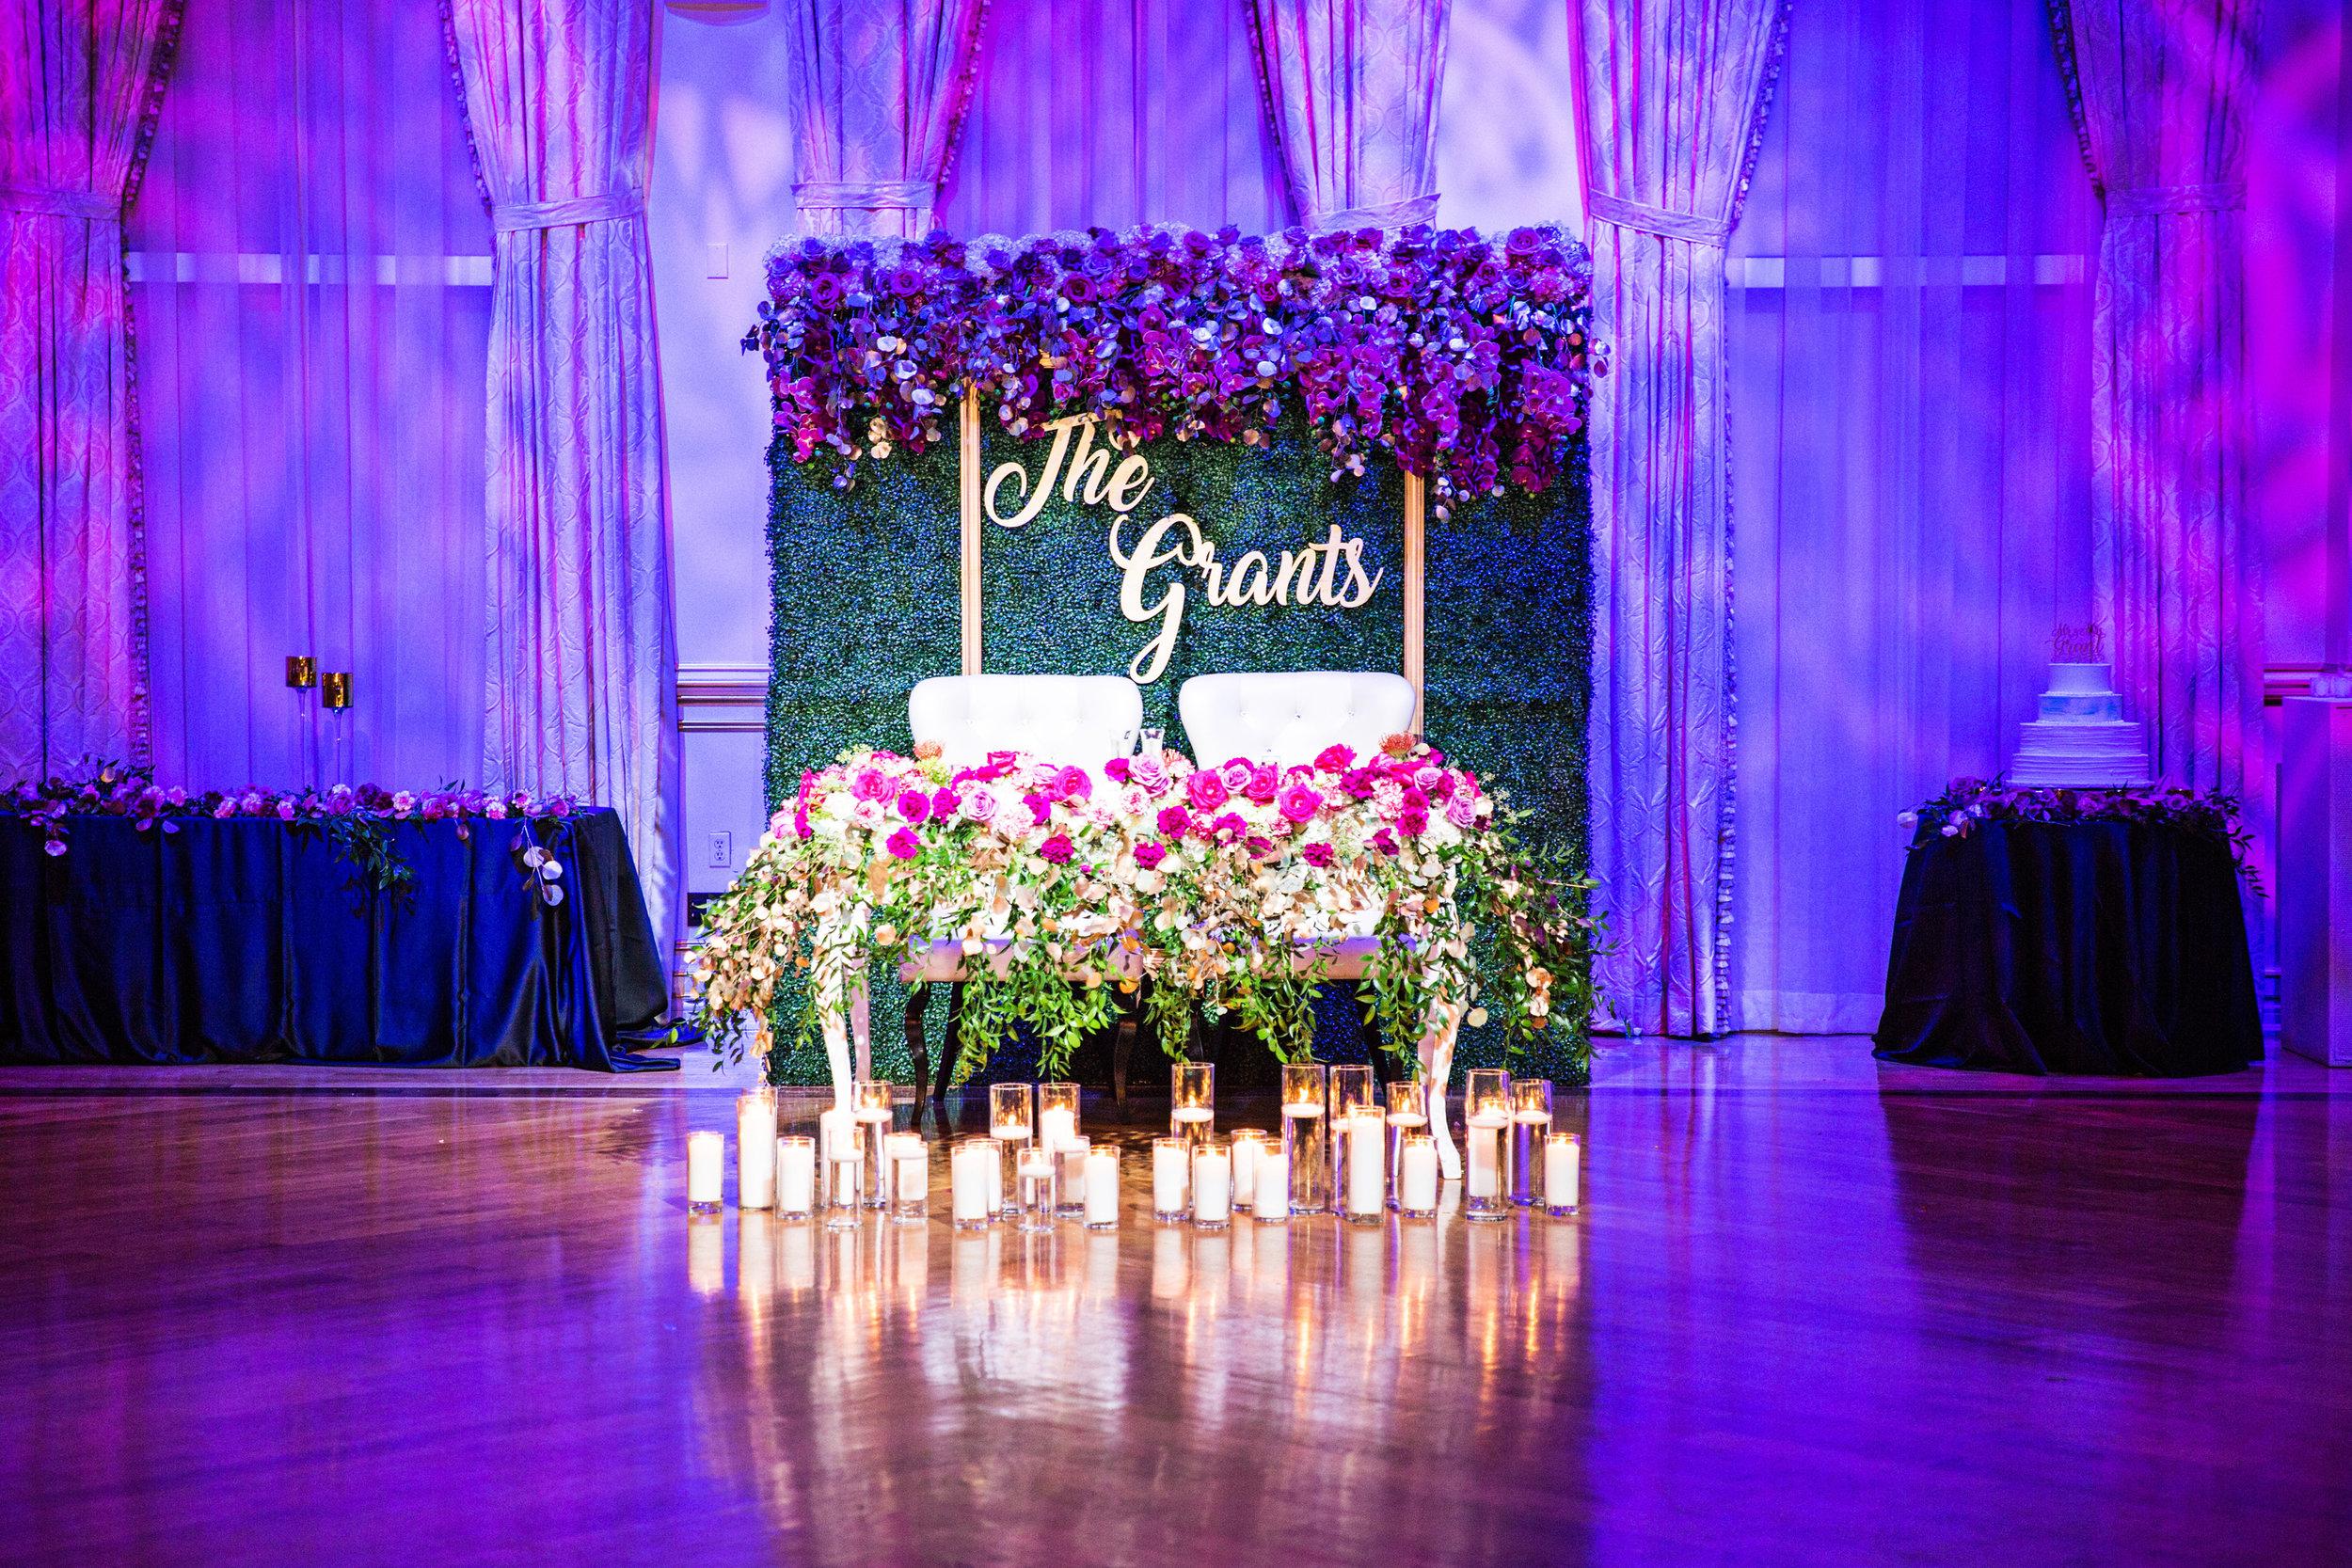 victorious-events-nyc-021-romie-kamali-tides-estate-wedding-nana-annan.jpg